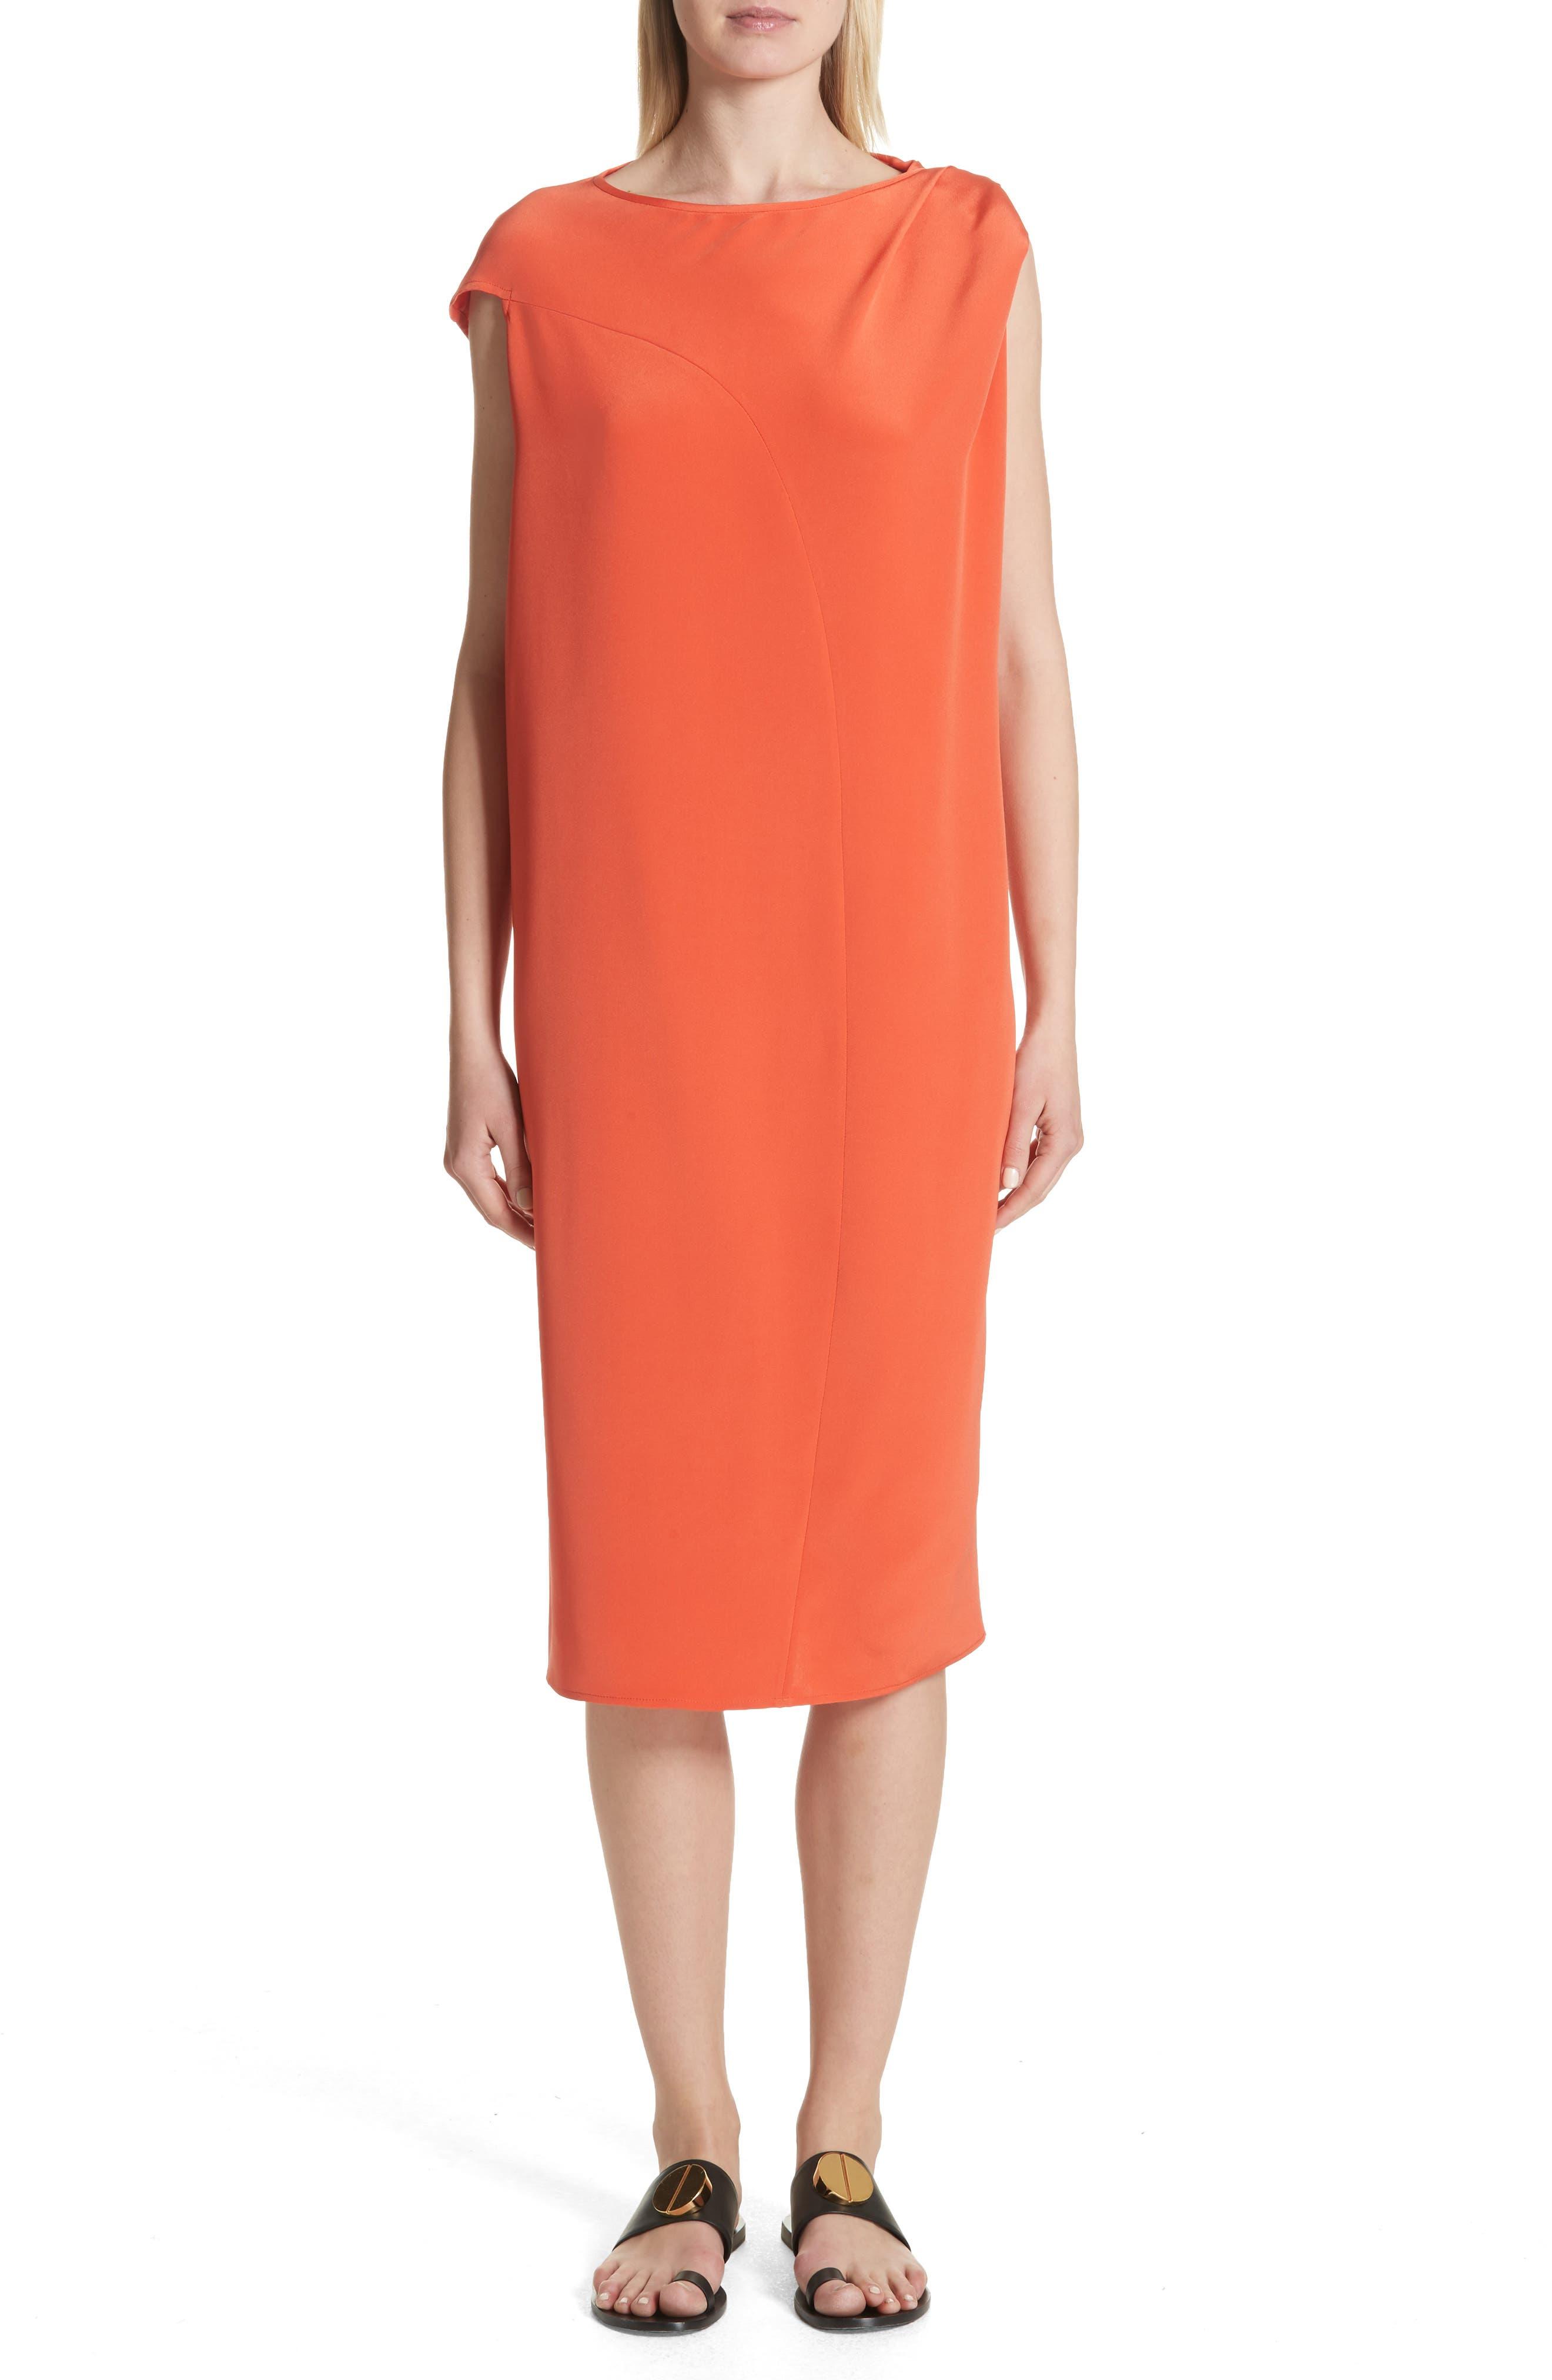 ZERO + MARIA CORNEJO Twist Detail Silk Dress, Main, color, 840